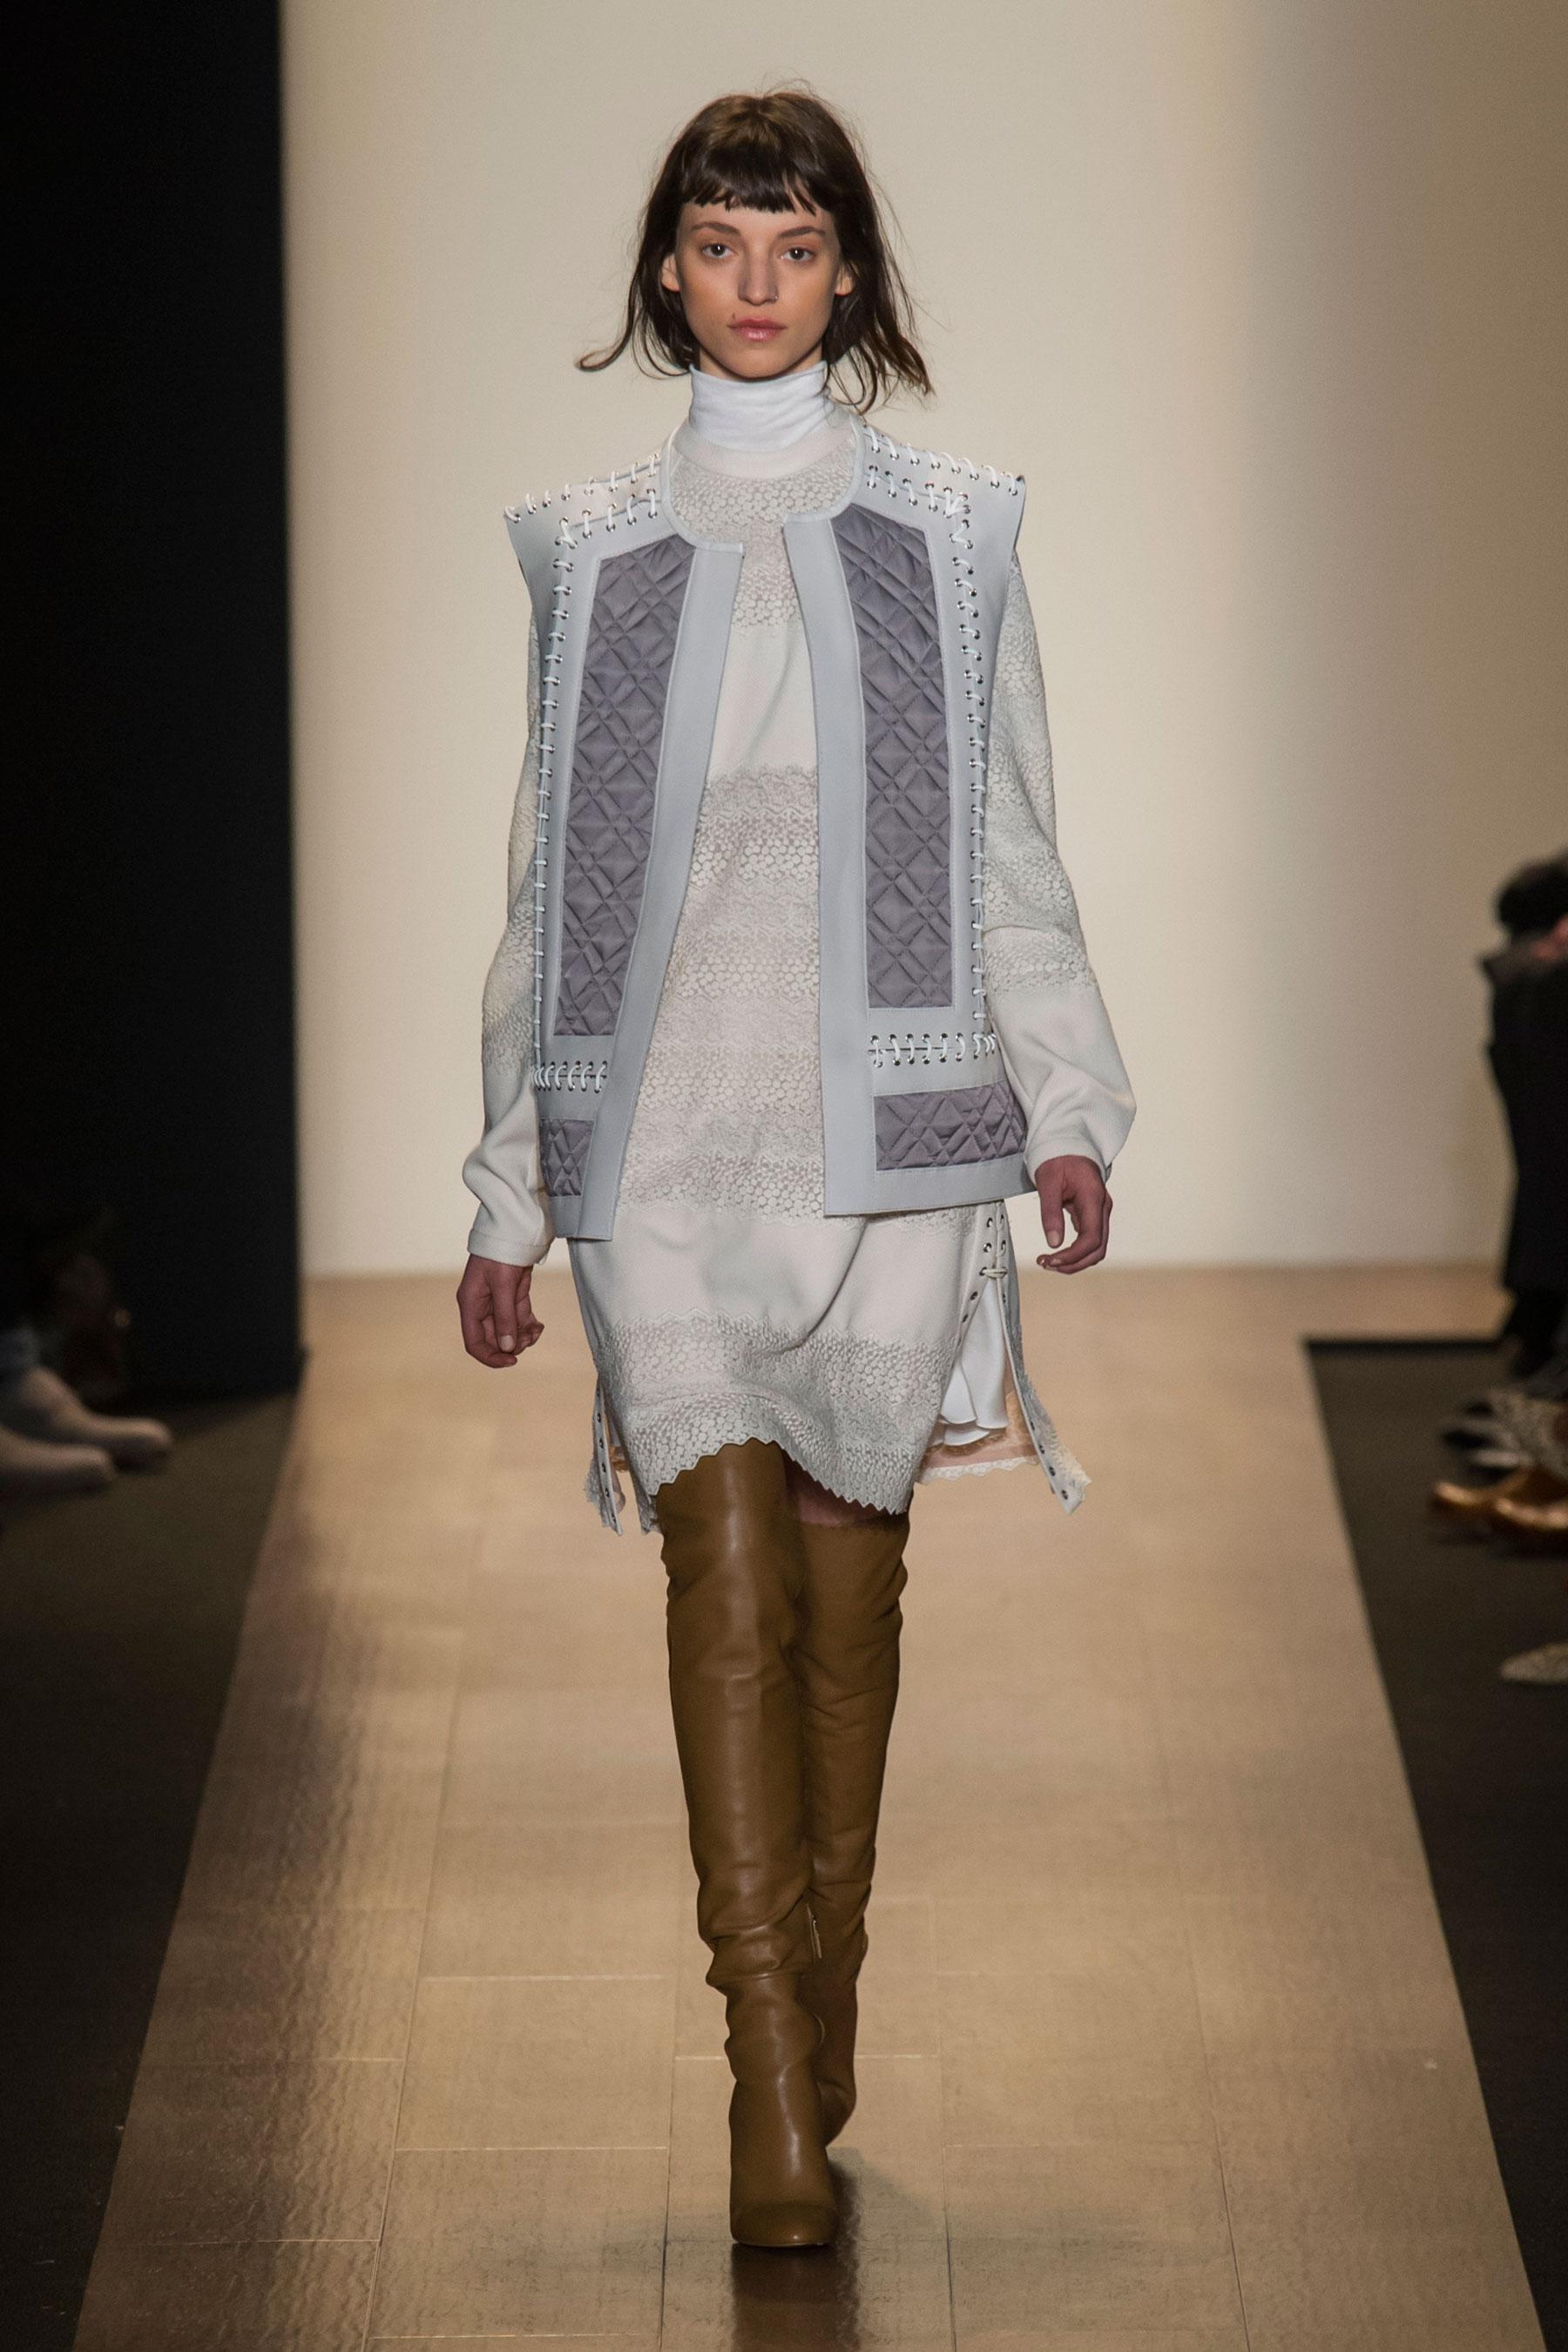 Défilé Bcbg Max Azria automne-hiver 2015-2016, New York - Look 5. Défilé  BCBG Max Azria Prêt-à-porter Automne-hiver 2015-2016 New York - photo 5  Imaxtree fff99a5a074